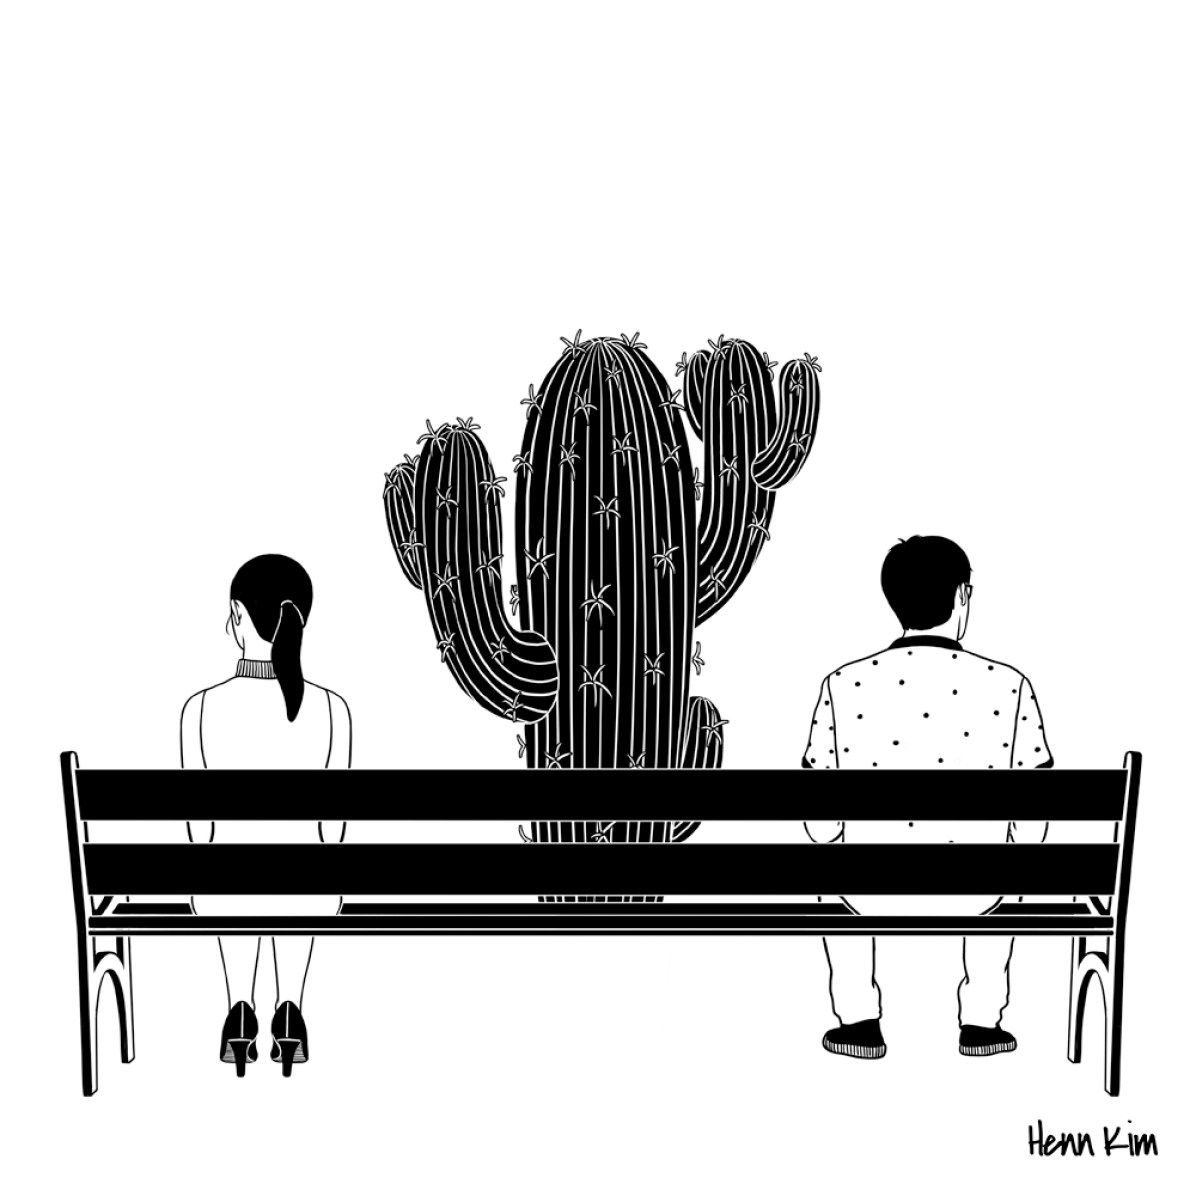 Loud Silence Between Us - Henn Kim